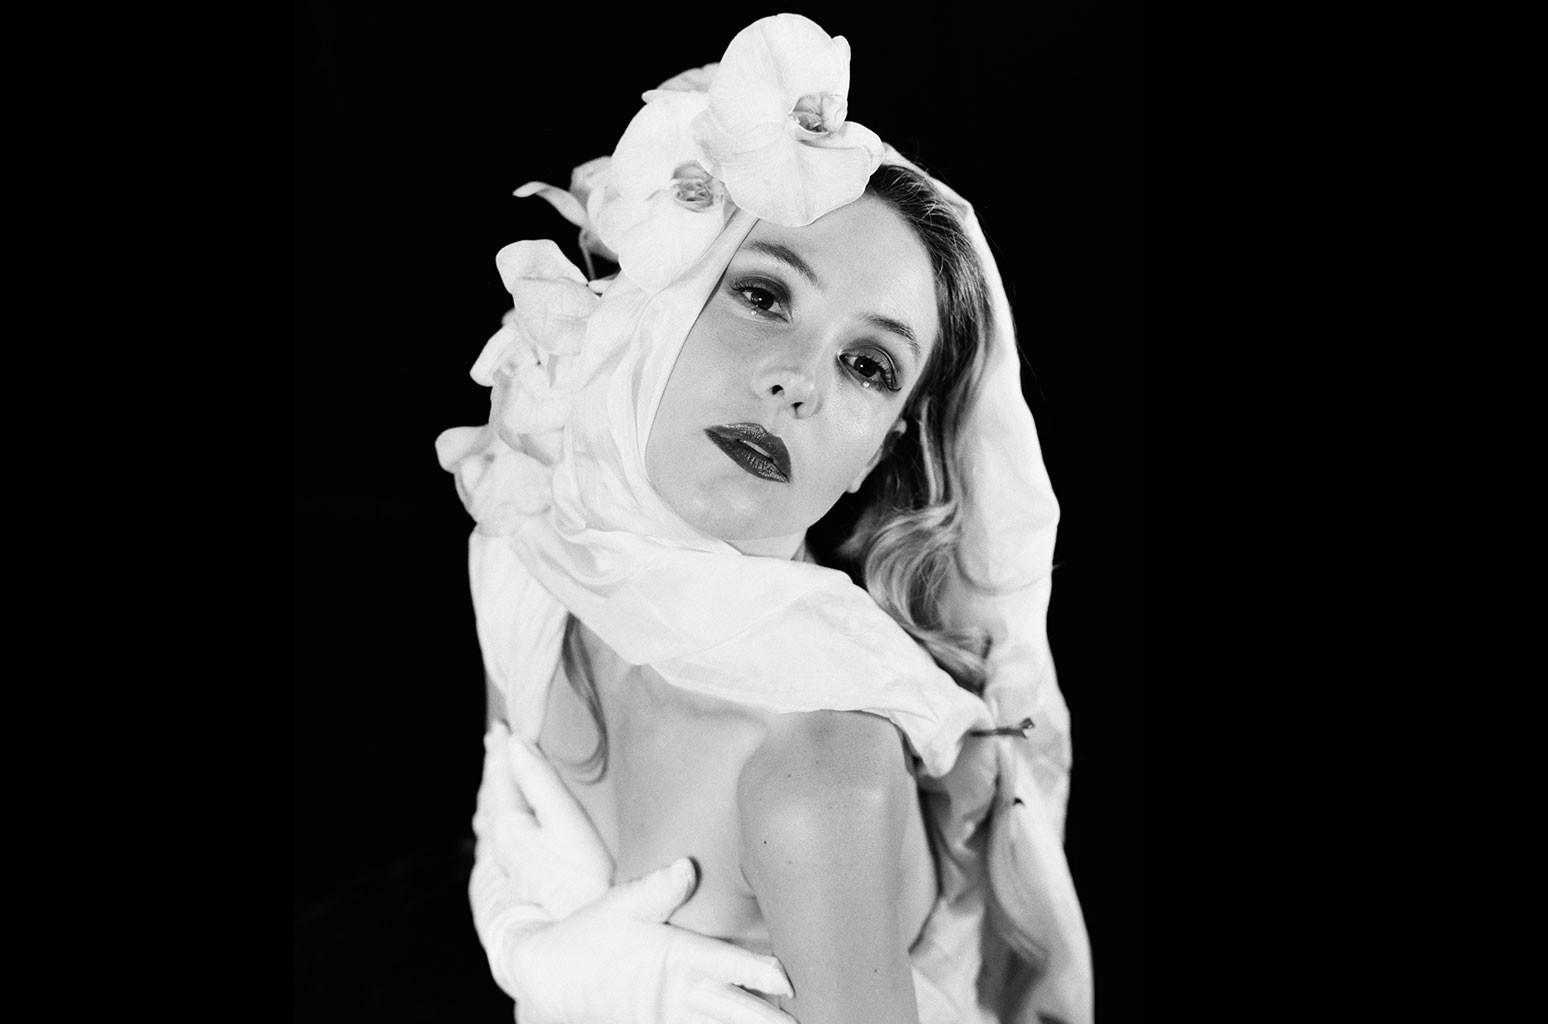 Samantha Sidley